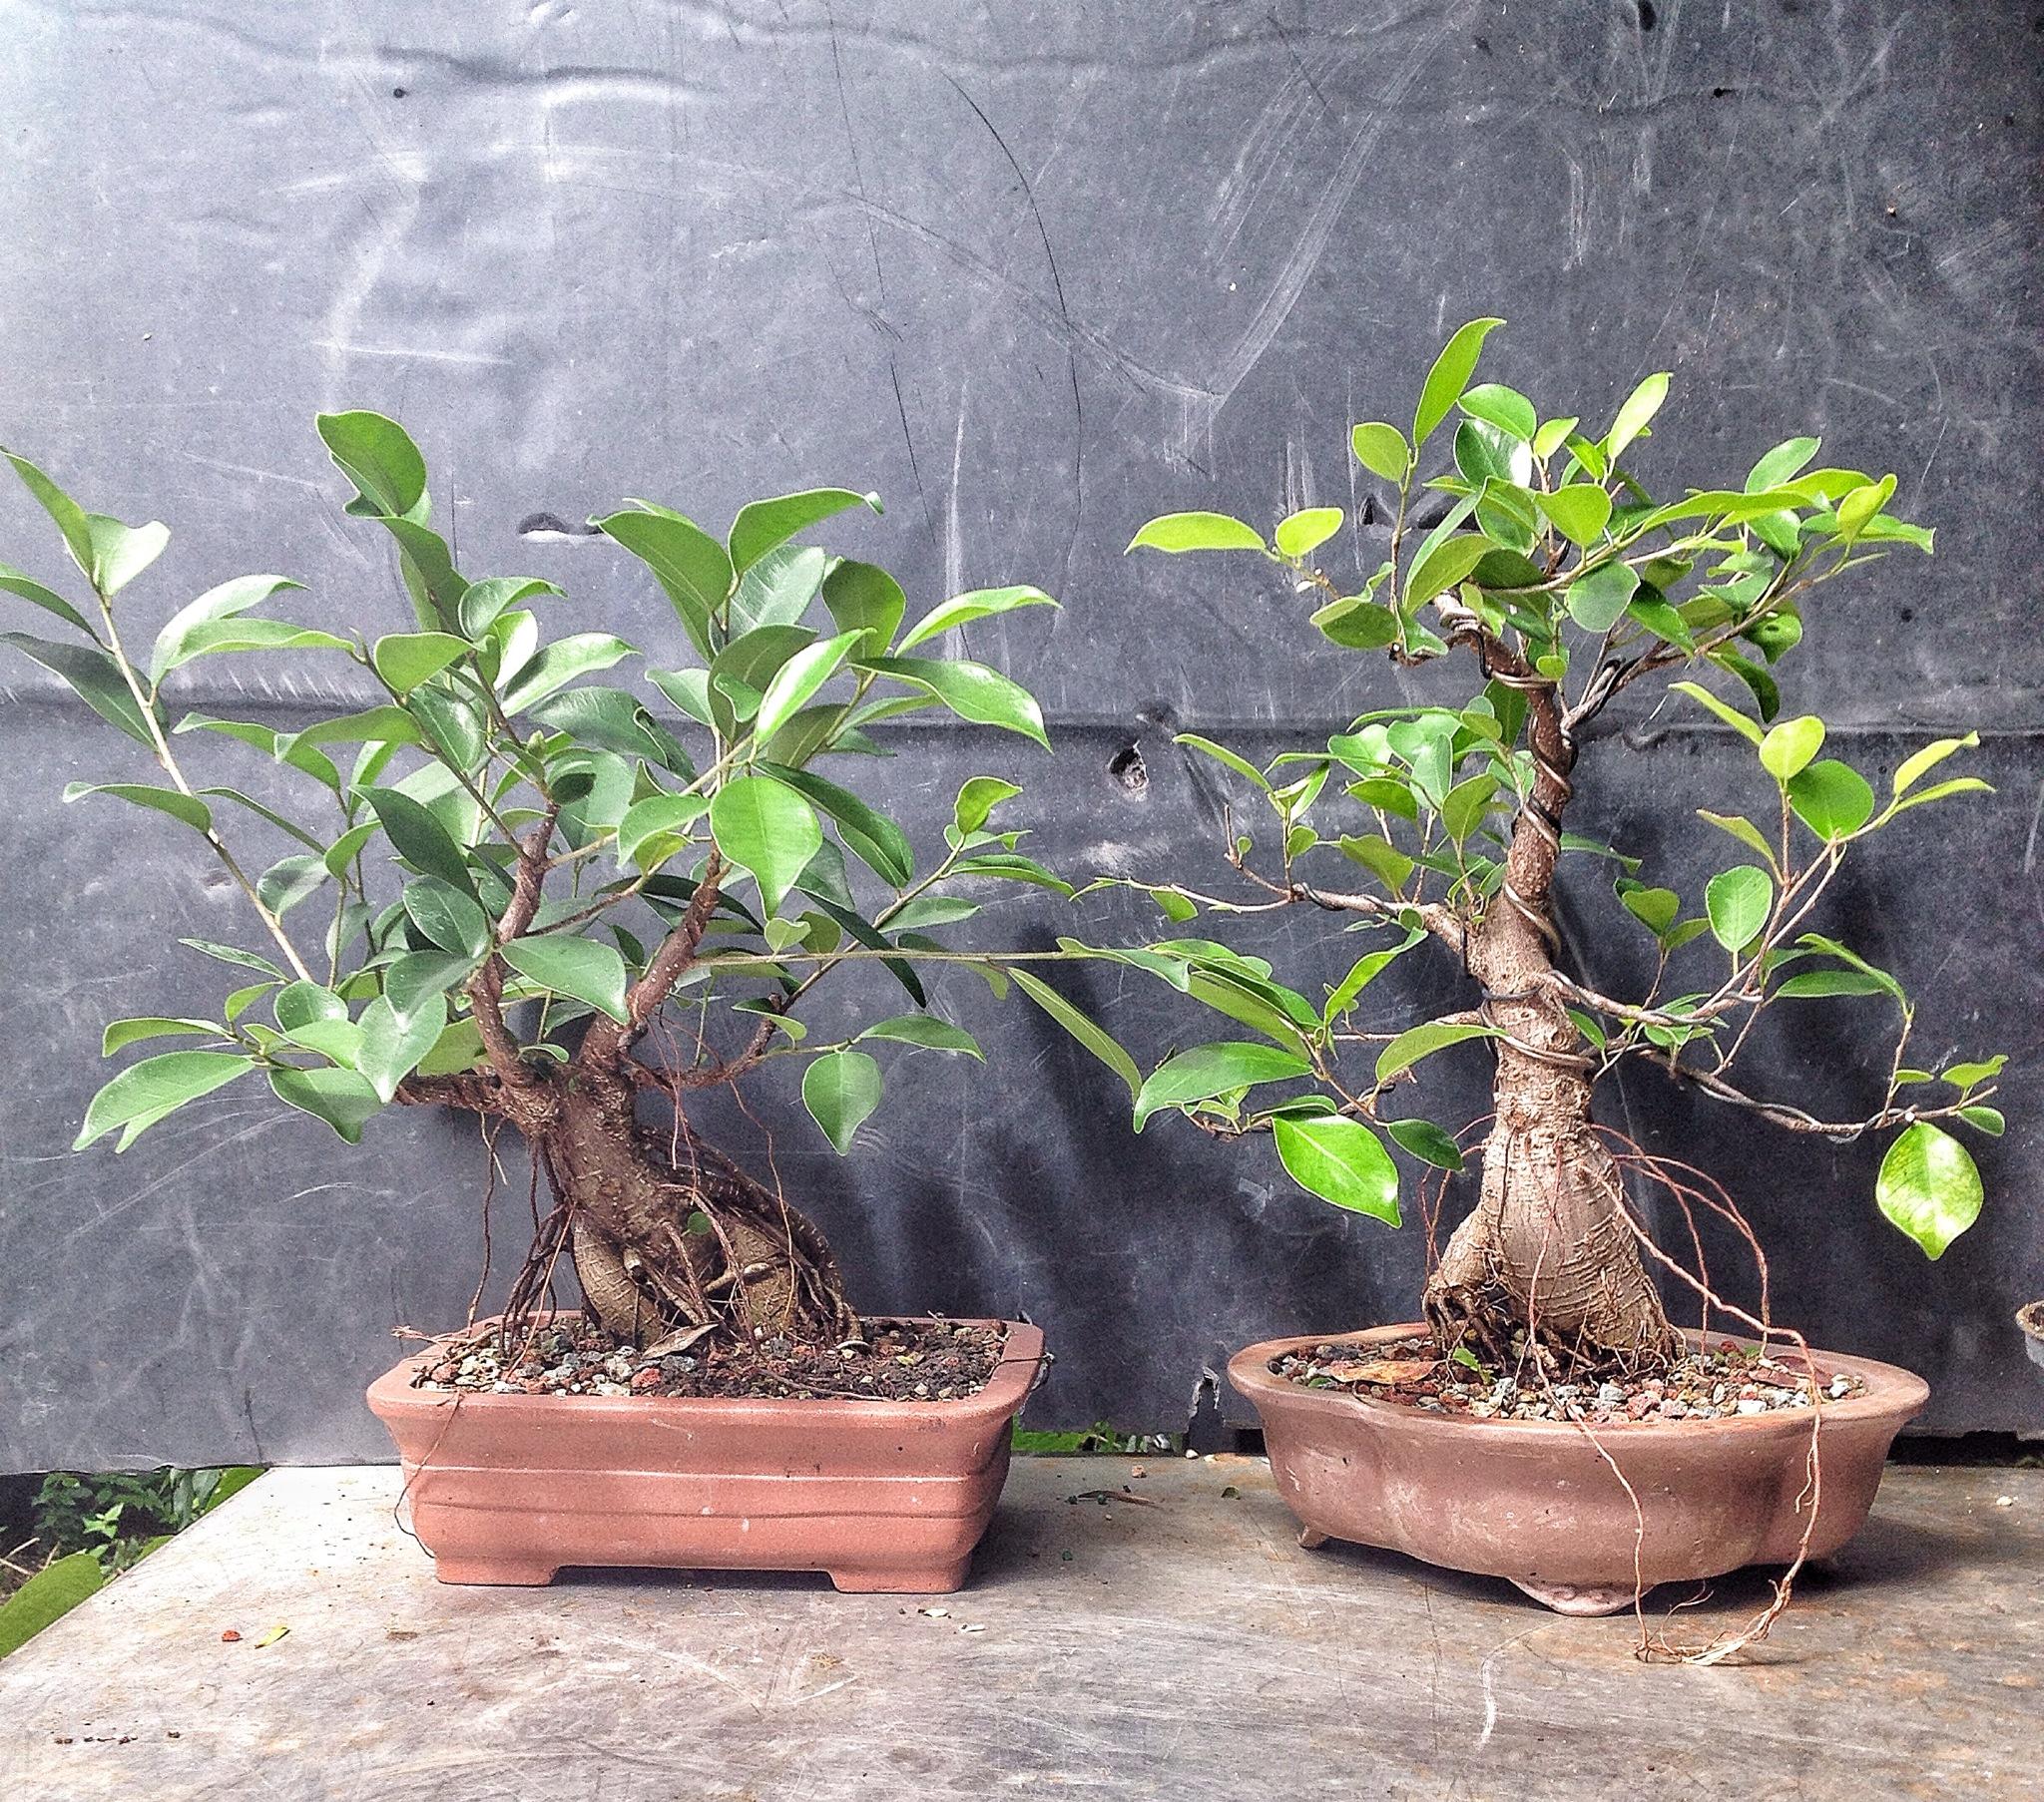 How to bonsai trees for beginners - Img_7390 Jpg